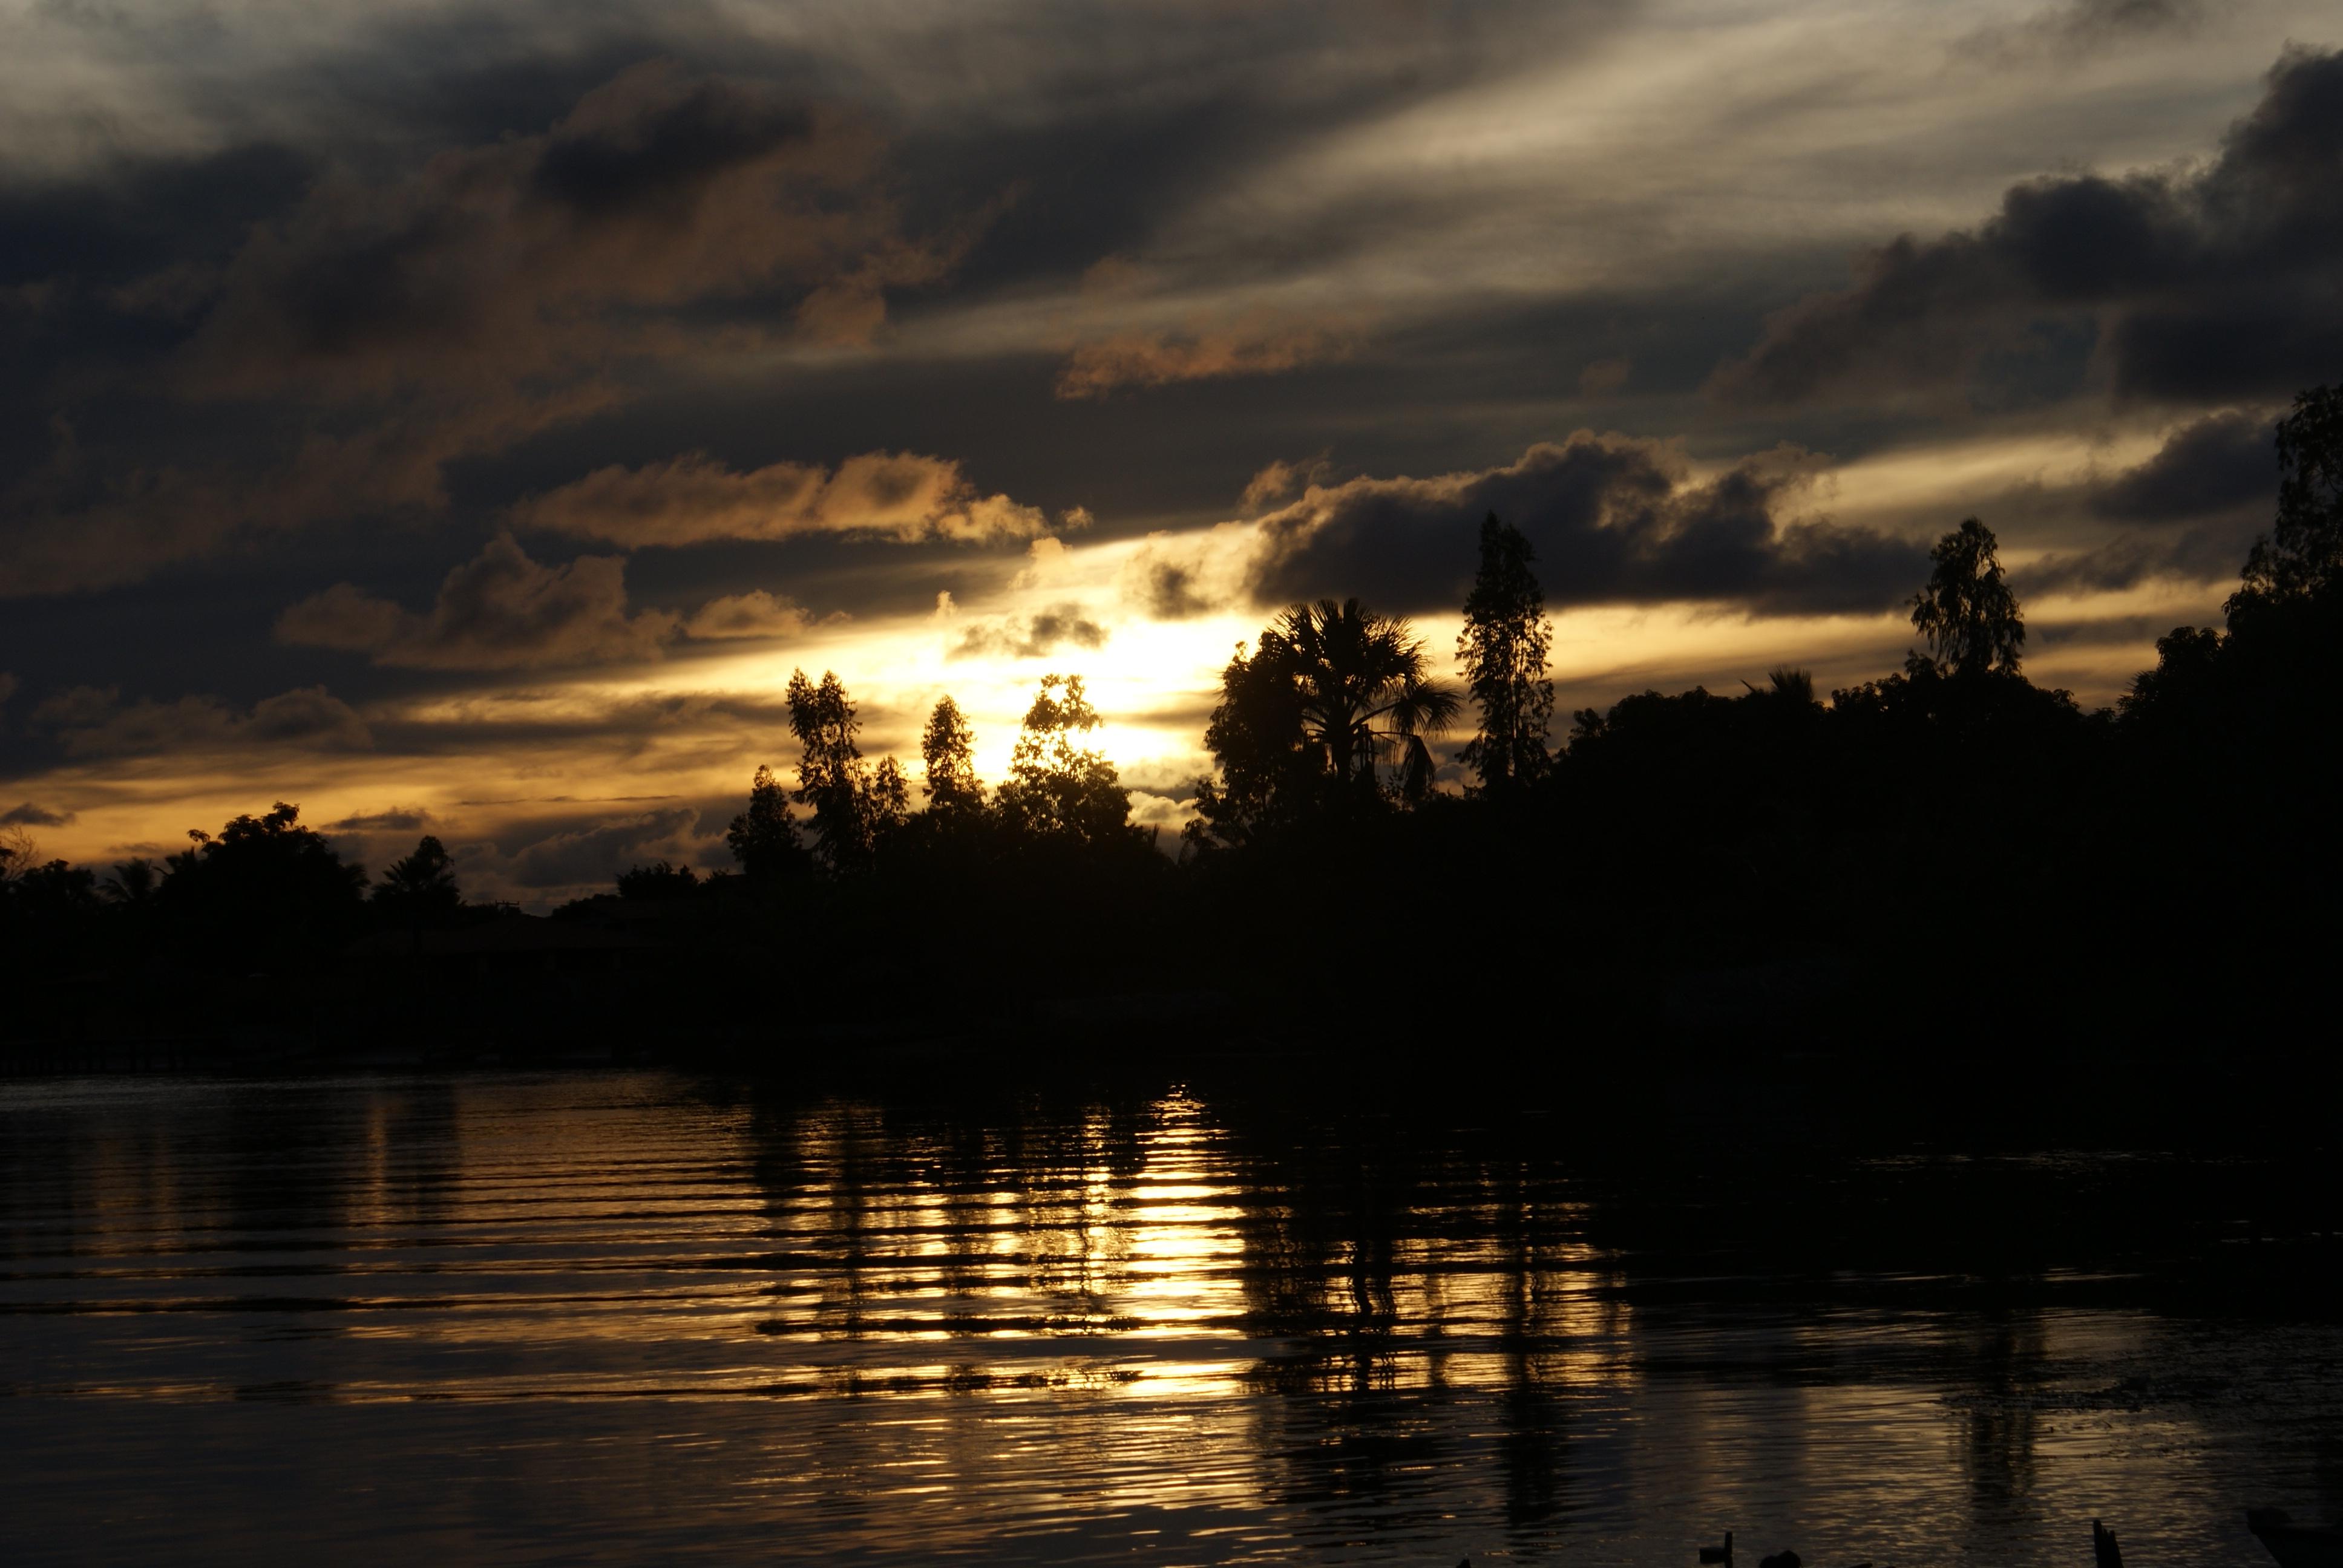 Free Images Beautiful Sunset River Nature Reflection Body Of Water Cloud Waterway Horizon Dusk Evening Lake Sunrise Atmosphere Tree Calm